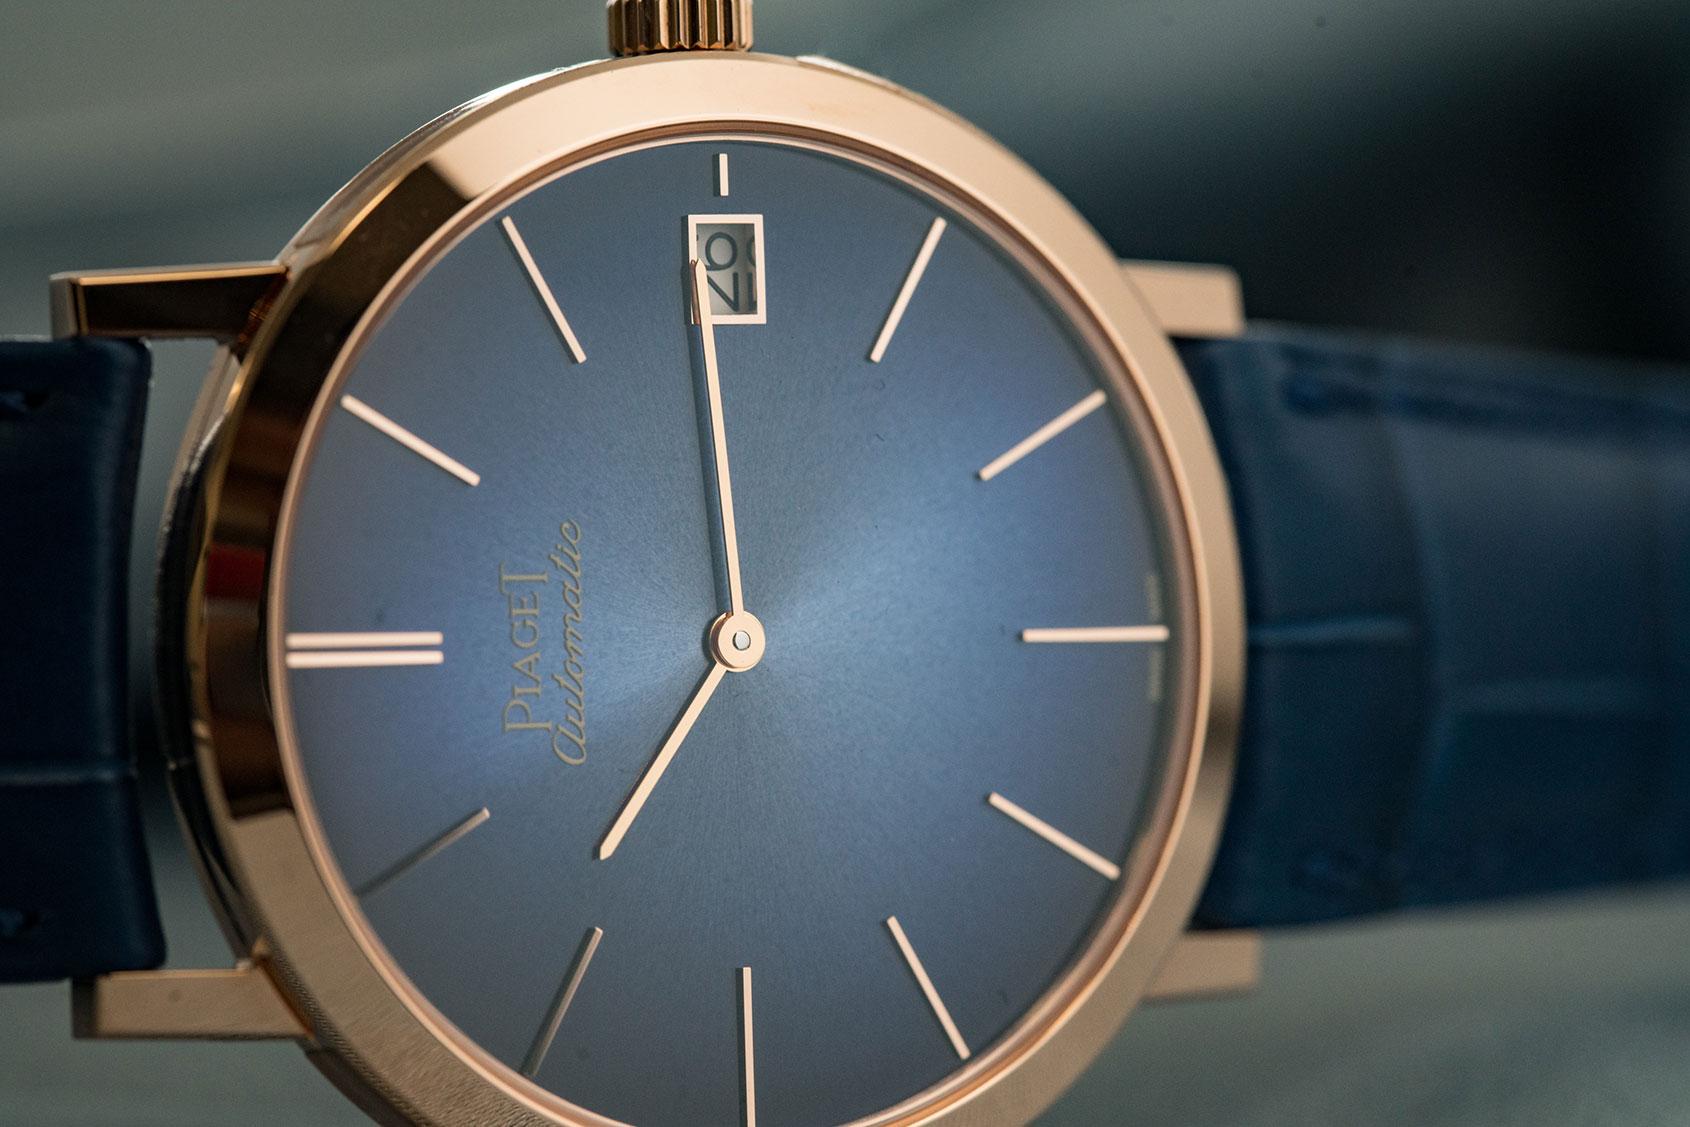 Piaget-alitplano-60-blue-3